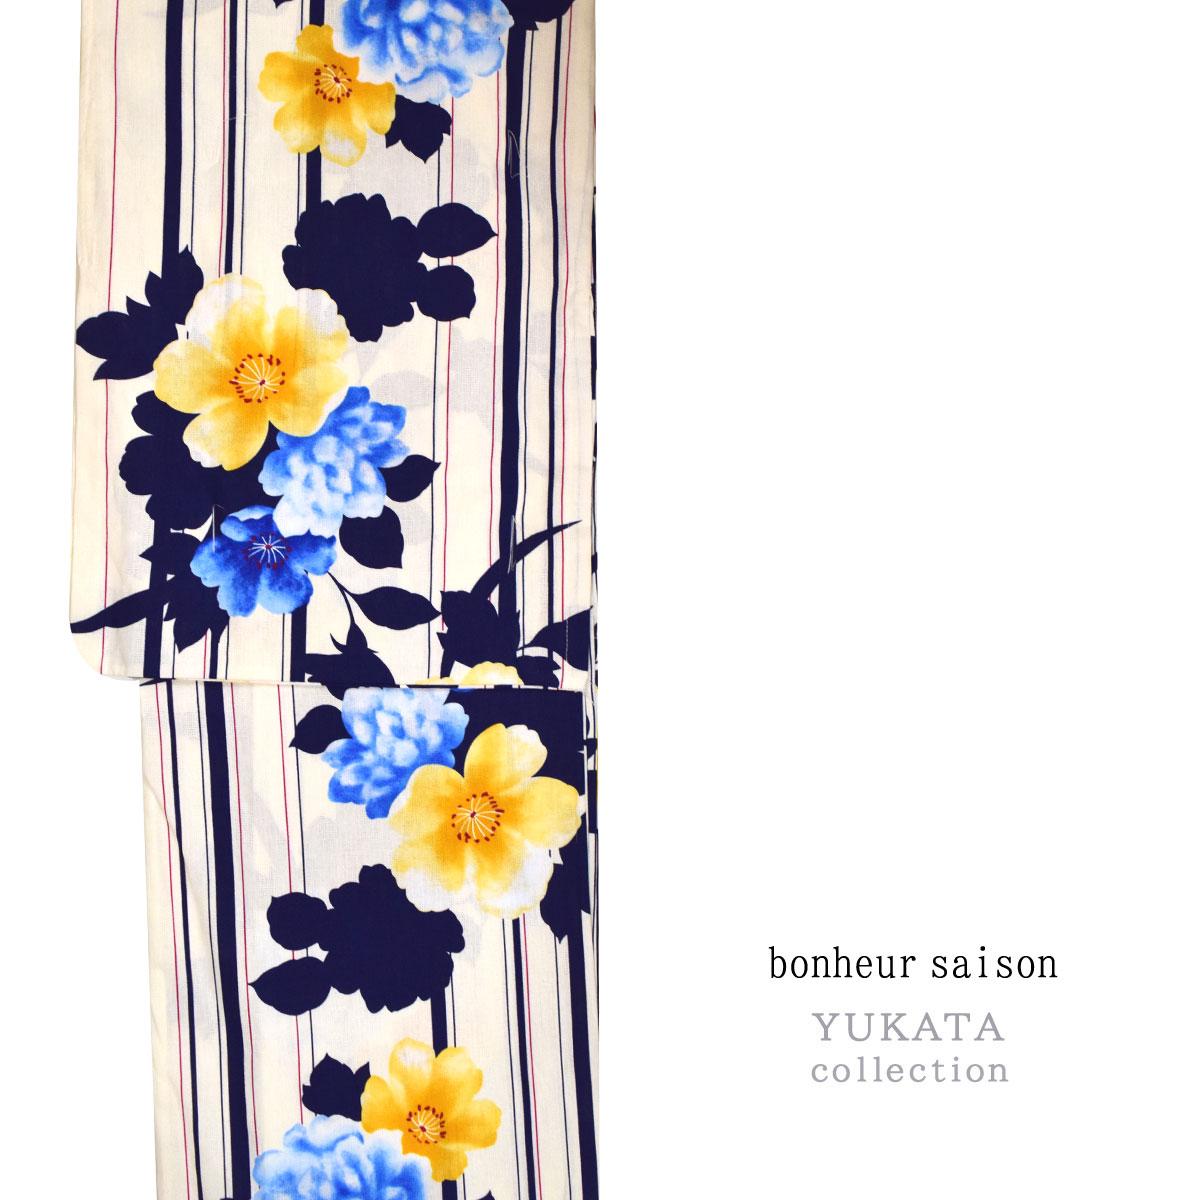 【bonheur saison】仕立て上がり 浴衣 単品 浴衣 ゆかた yukata お祭り 夏 イベント レディース番号f625-204【2019MB】